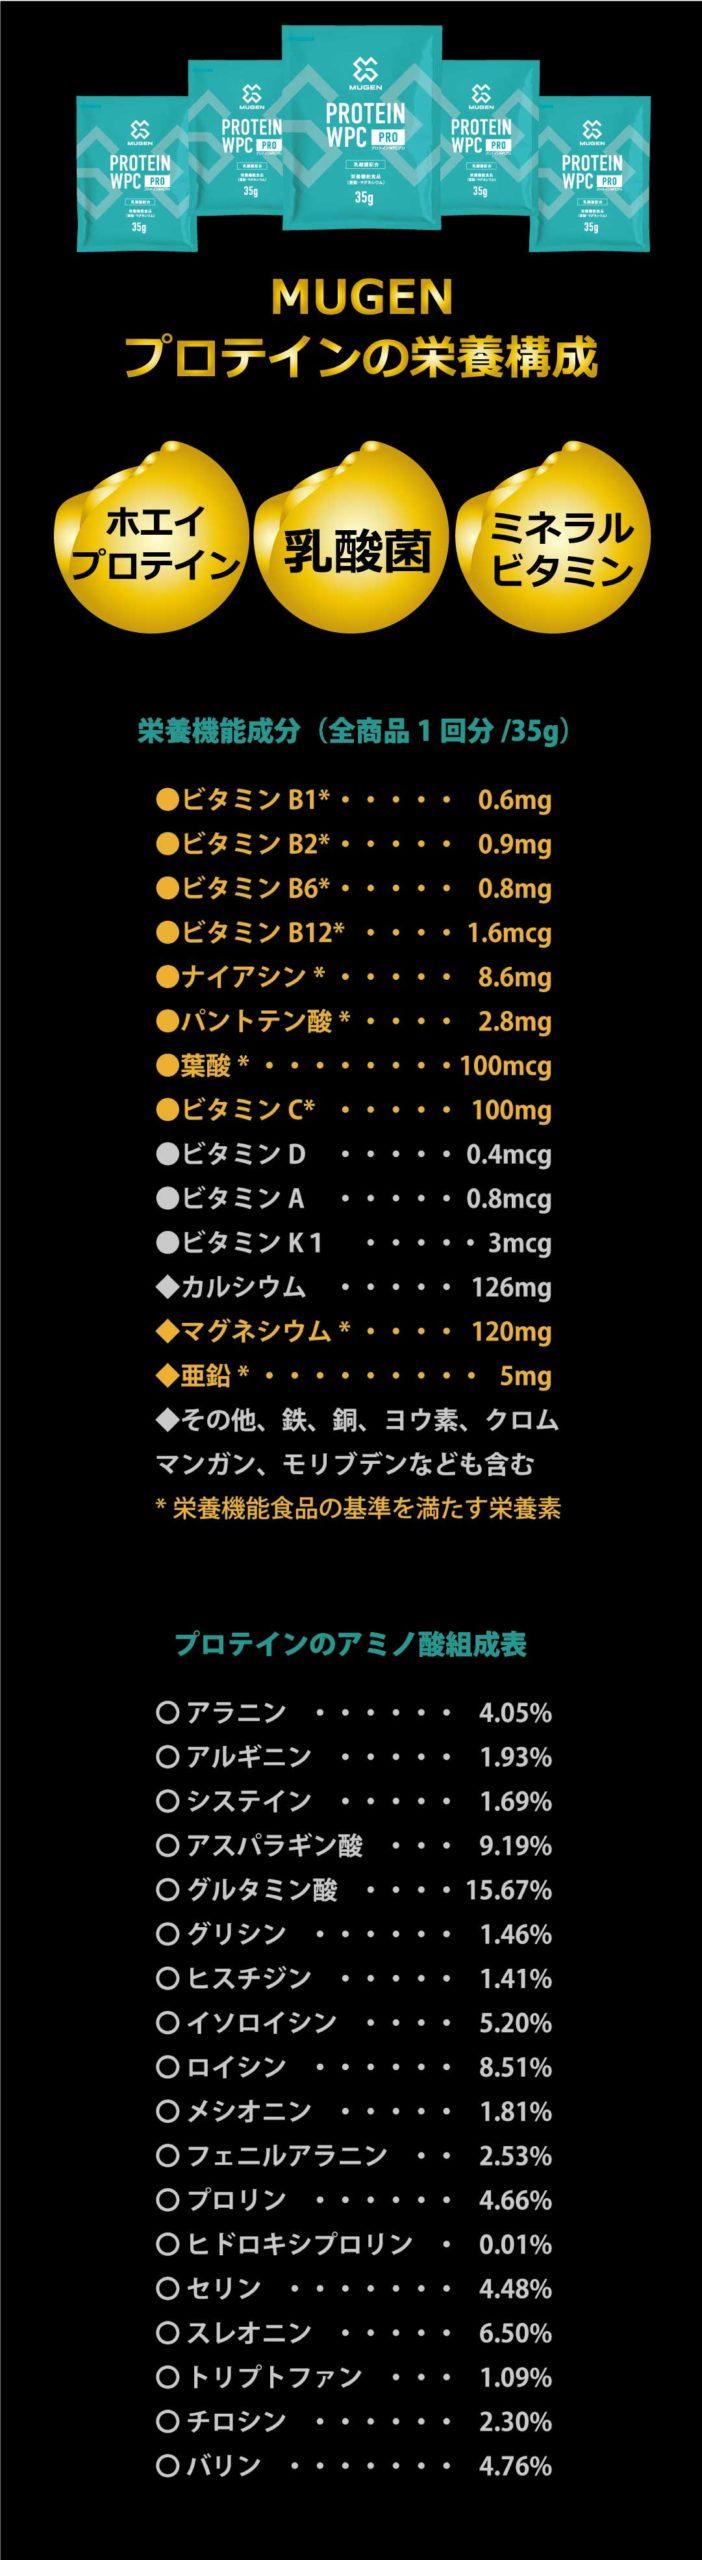 MUGENプロテインの栄養構成